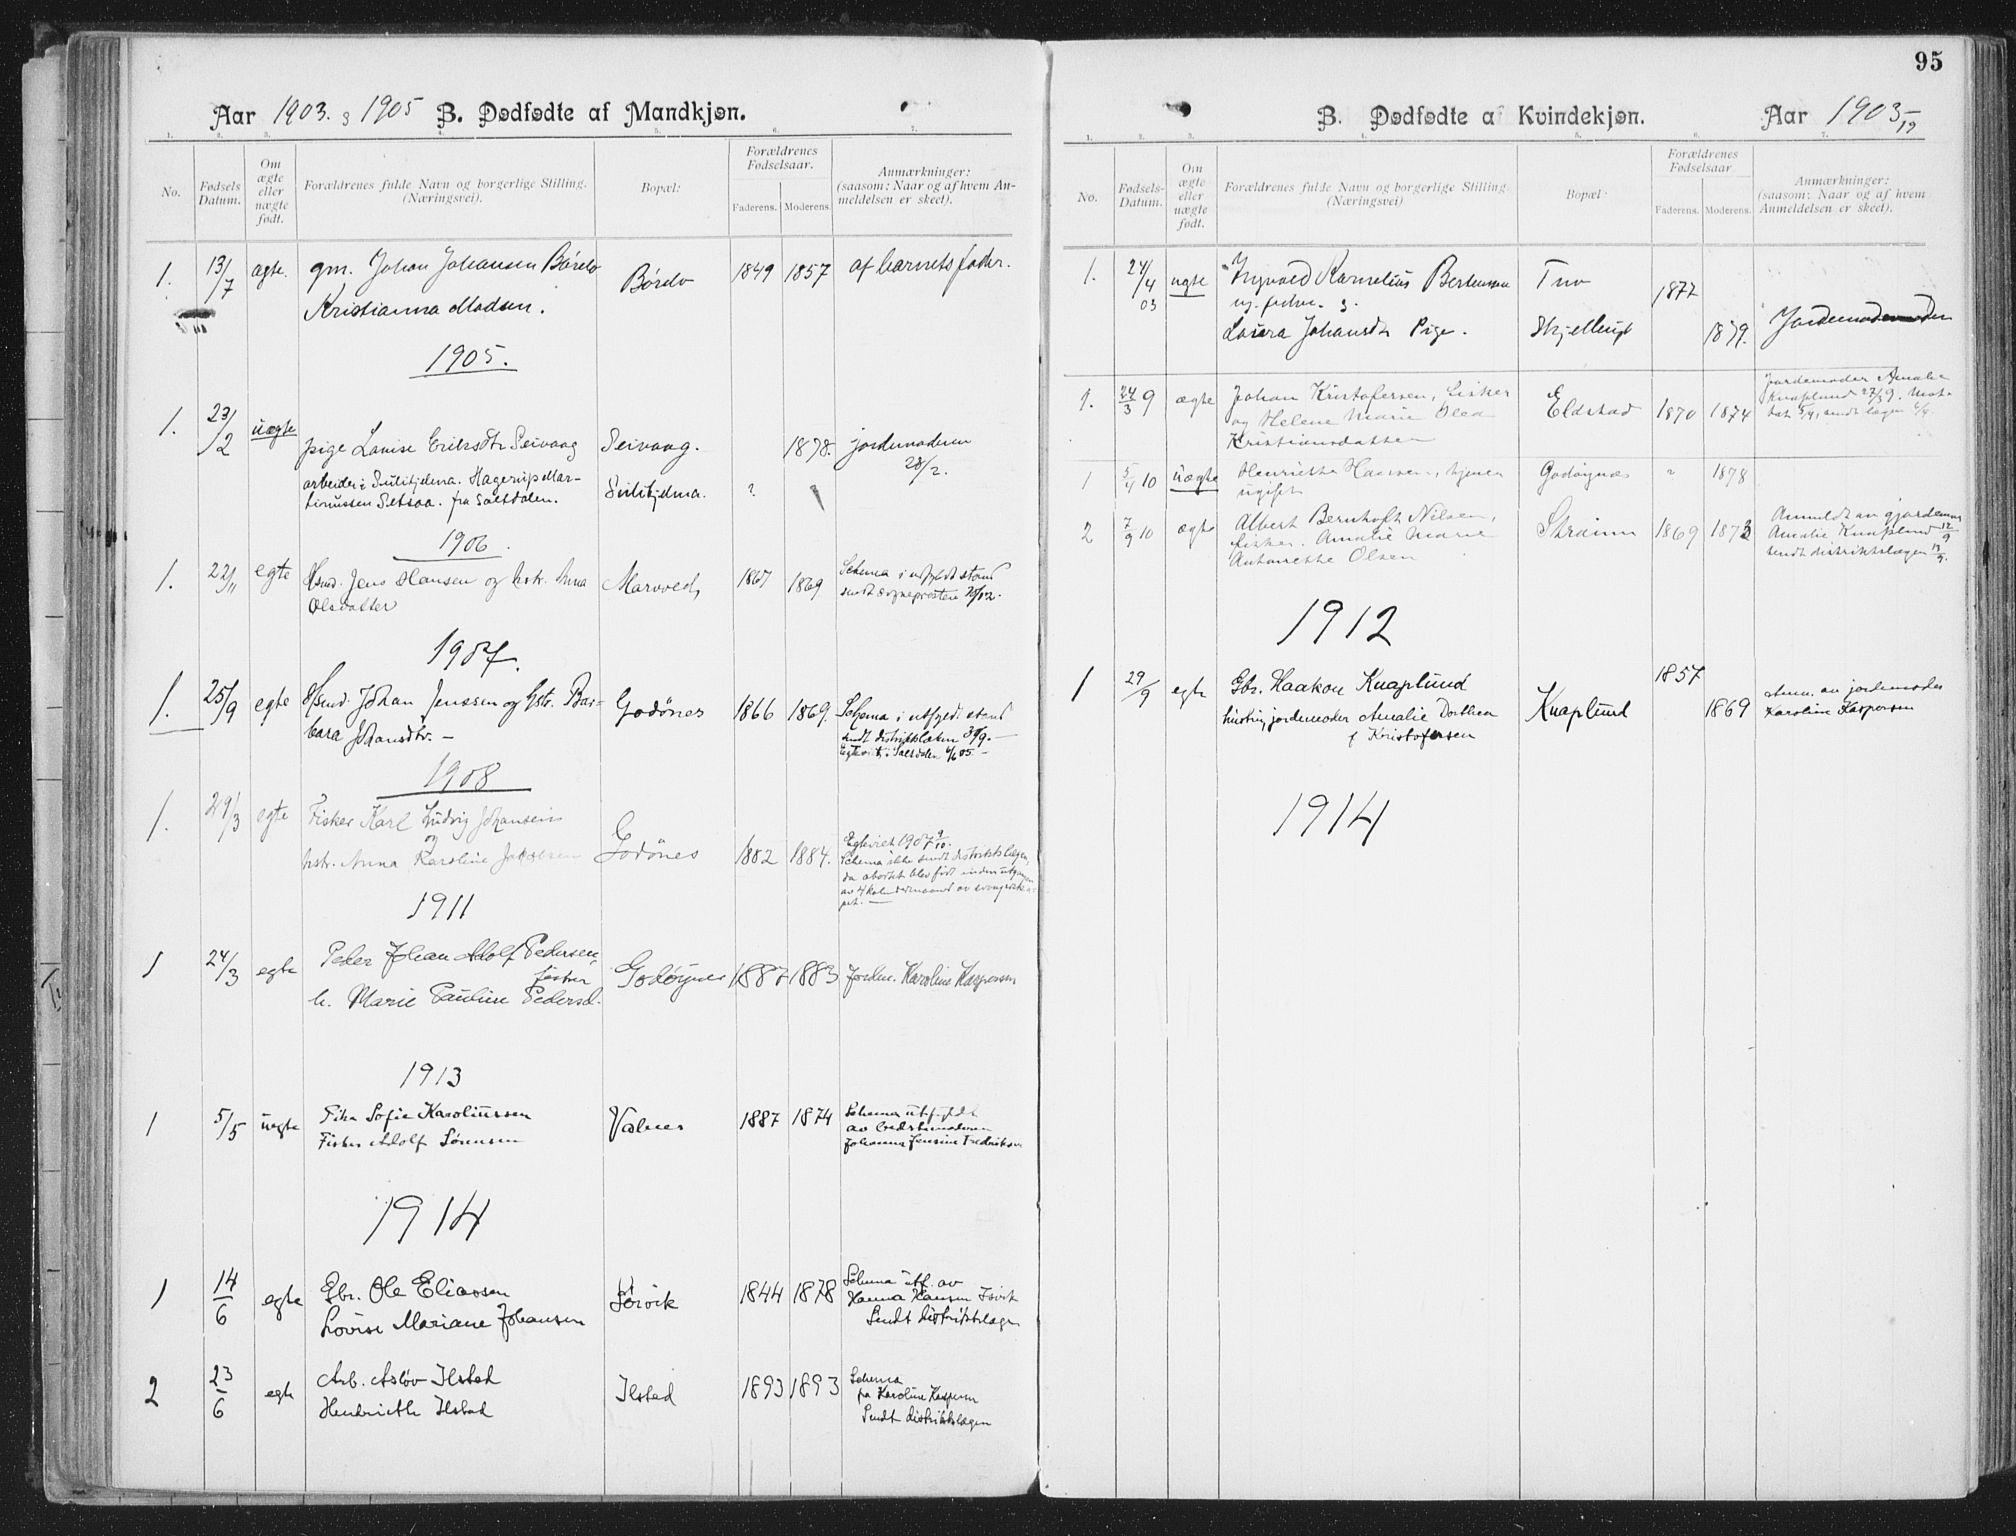 SAT, Ministerialprotokoller, klokkerbøker og fødselsregistre - Nordland, 804/L0081: Ministerialbok nr. 804A02, 1901-1915, s. 95